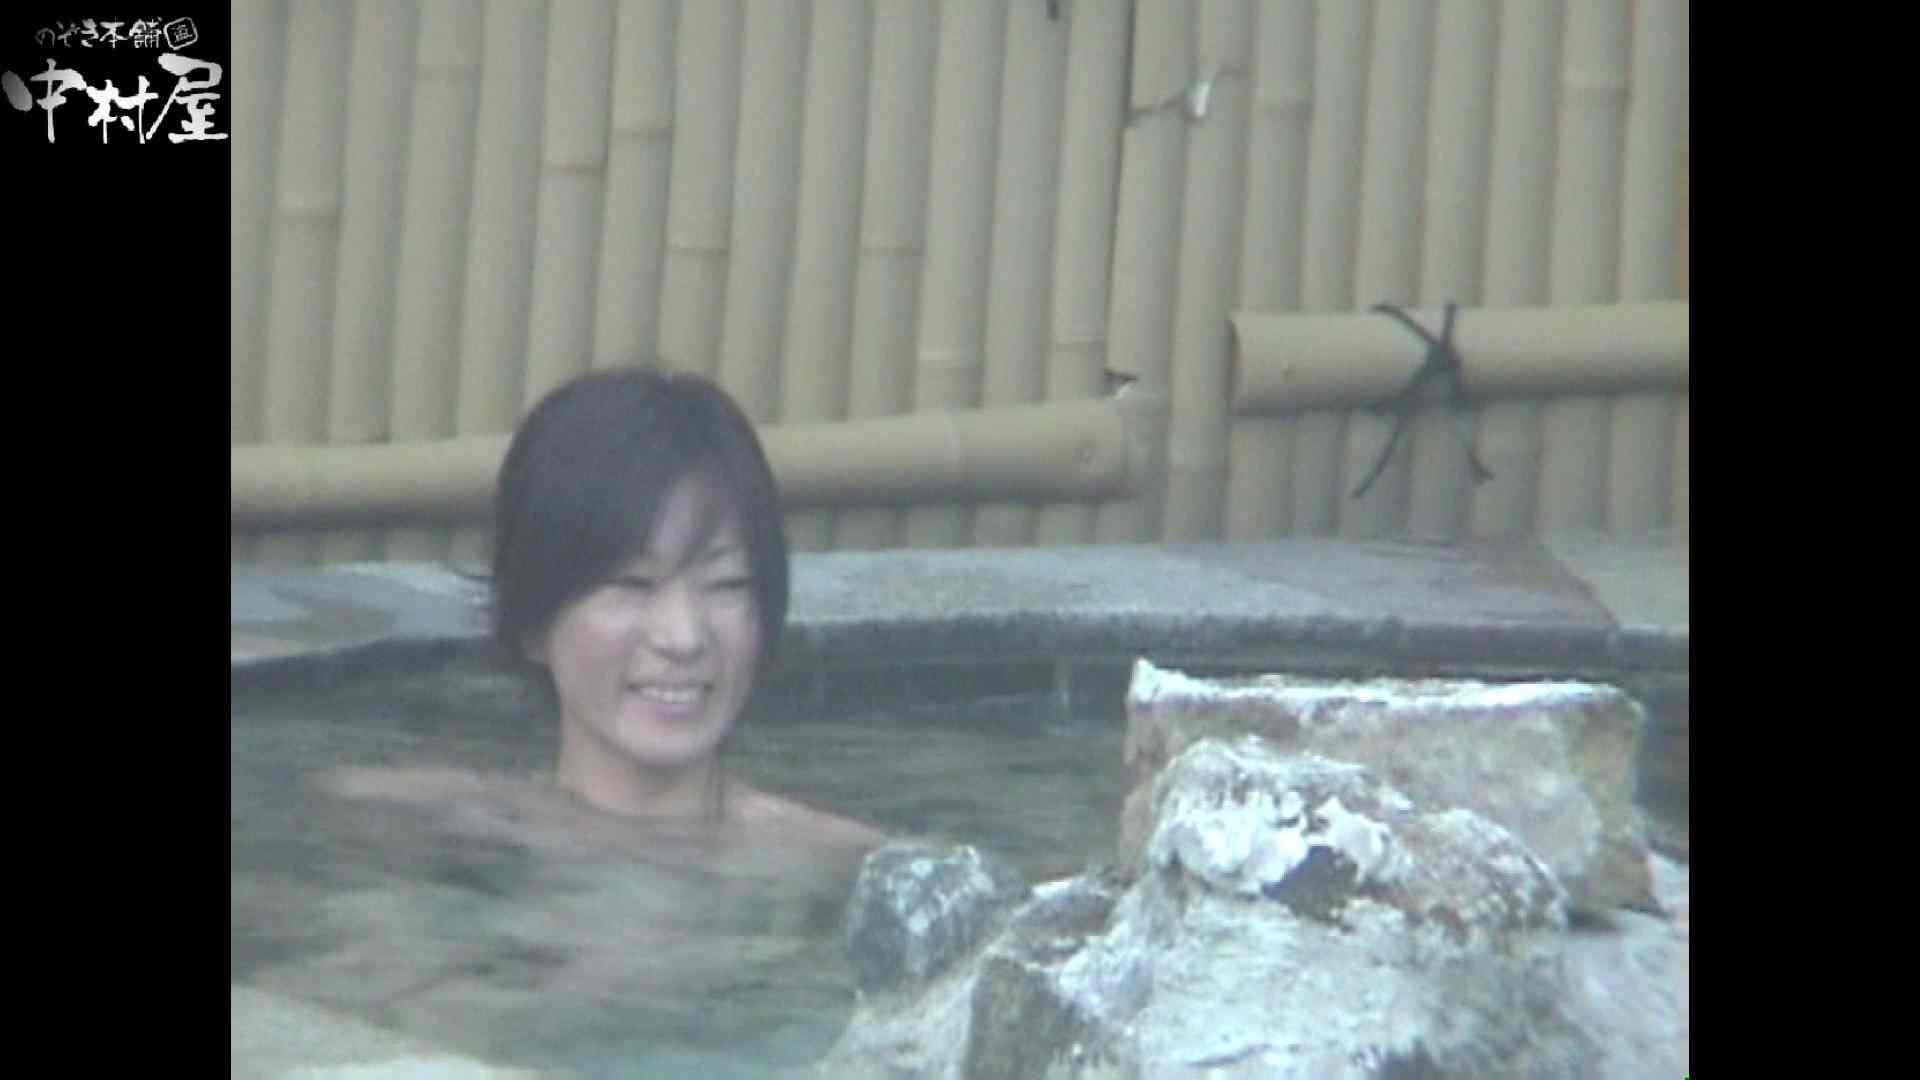 Aquaな露天風呂Vol.972 盗撮 おまんこ動画流出 80画像 35